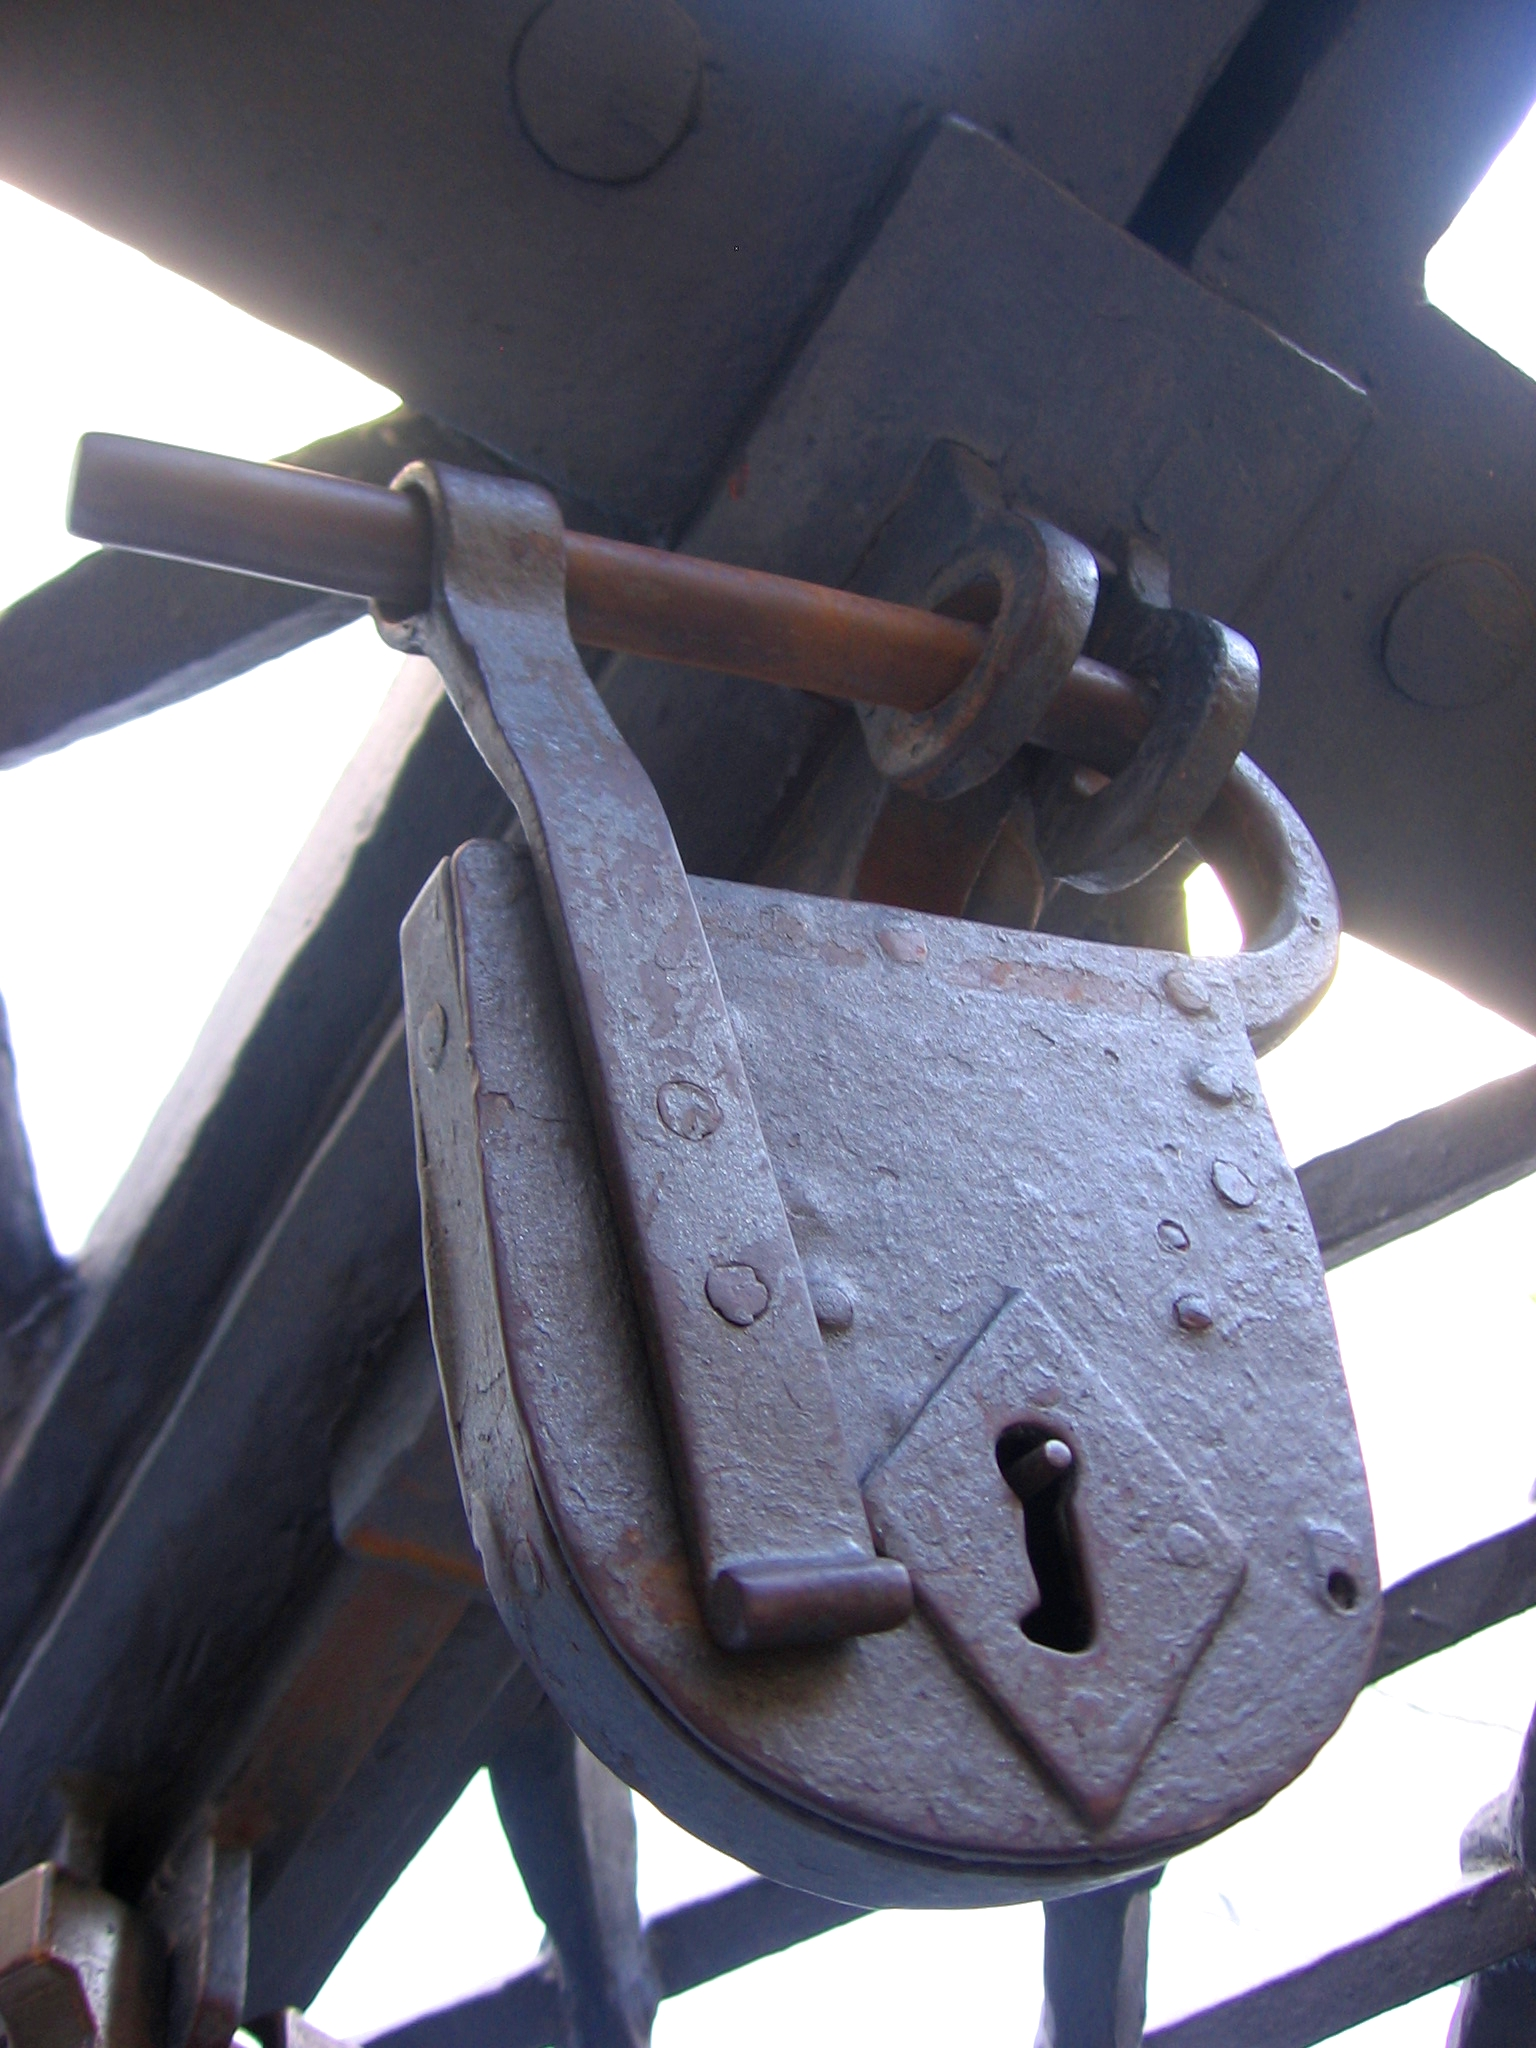 (Courtesy: Joshua Sherurcij) An old padlock